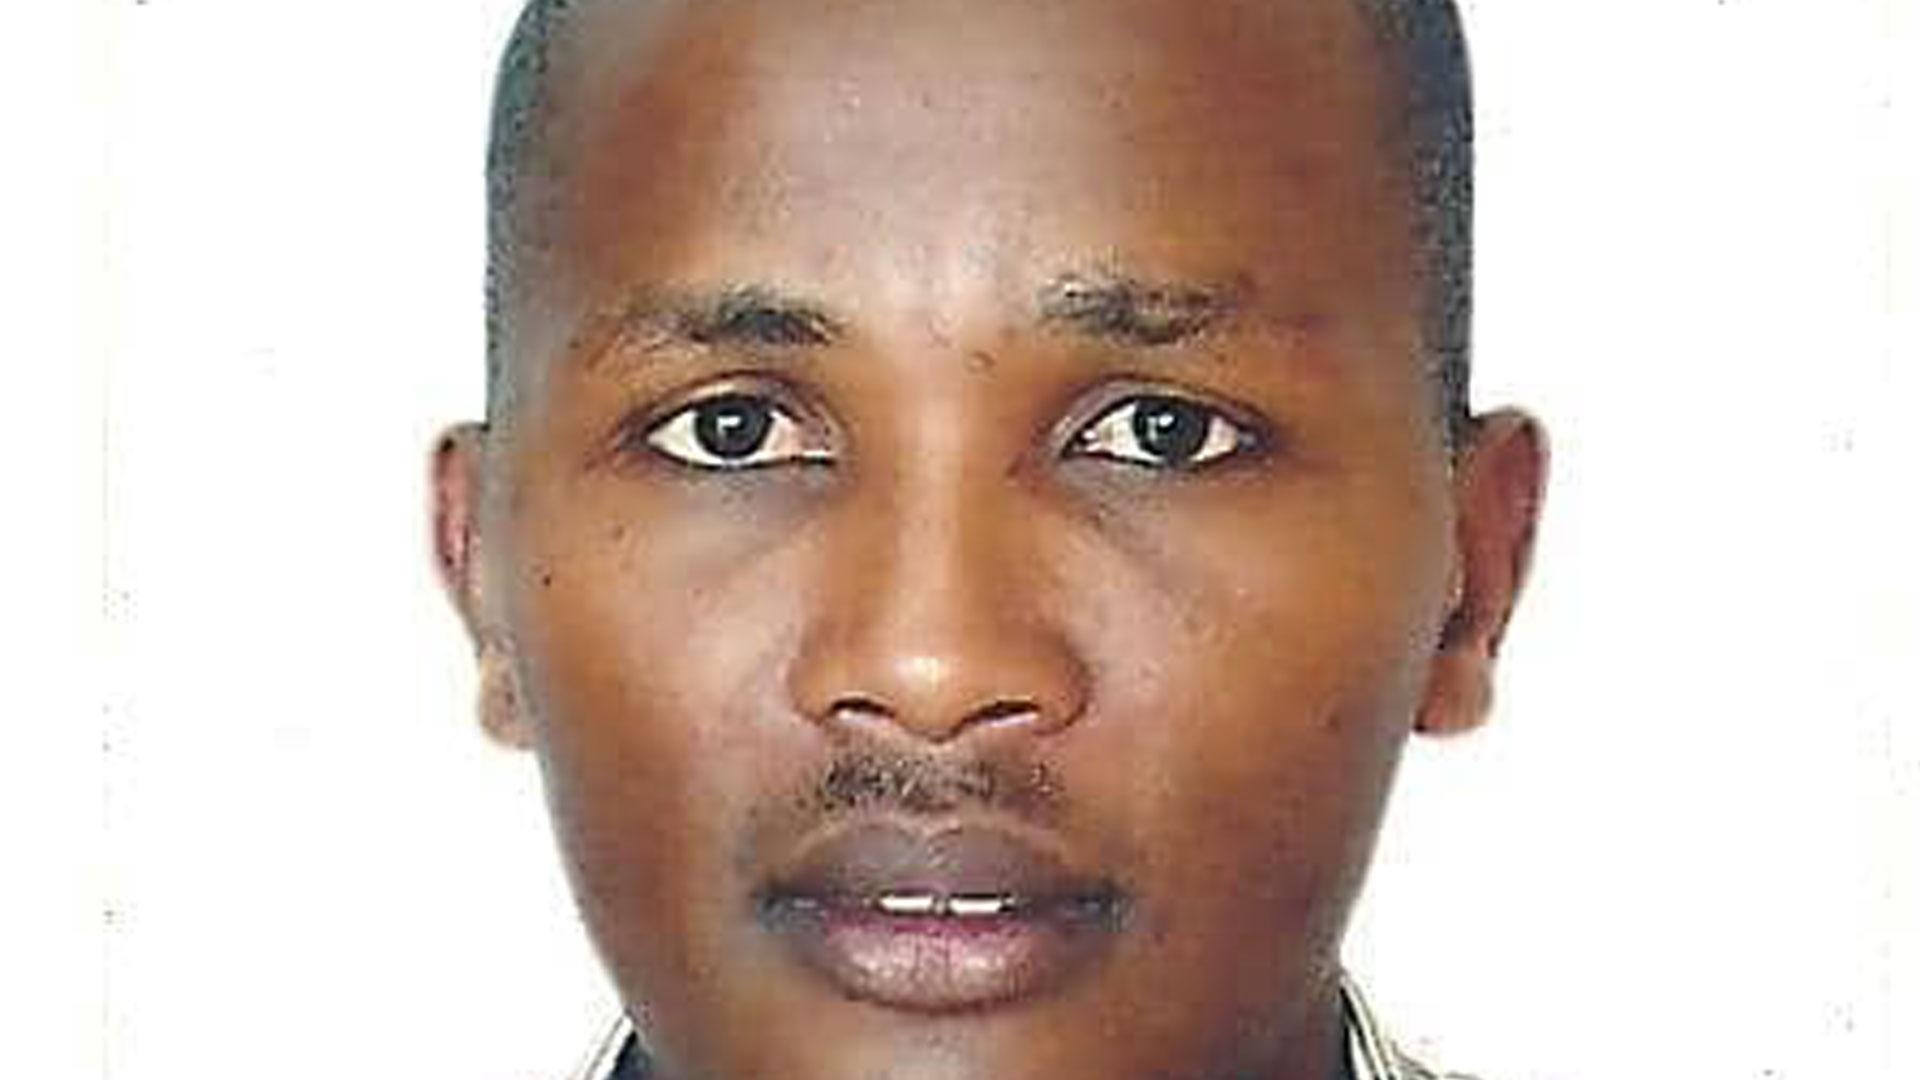 Kenya : Décès soudain du journaliste rwandais Christophe Kanuma